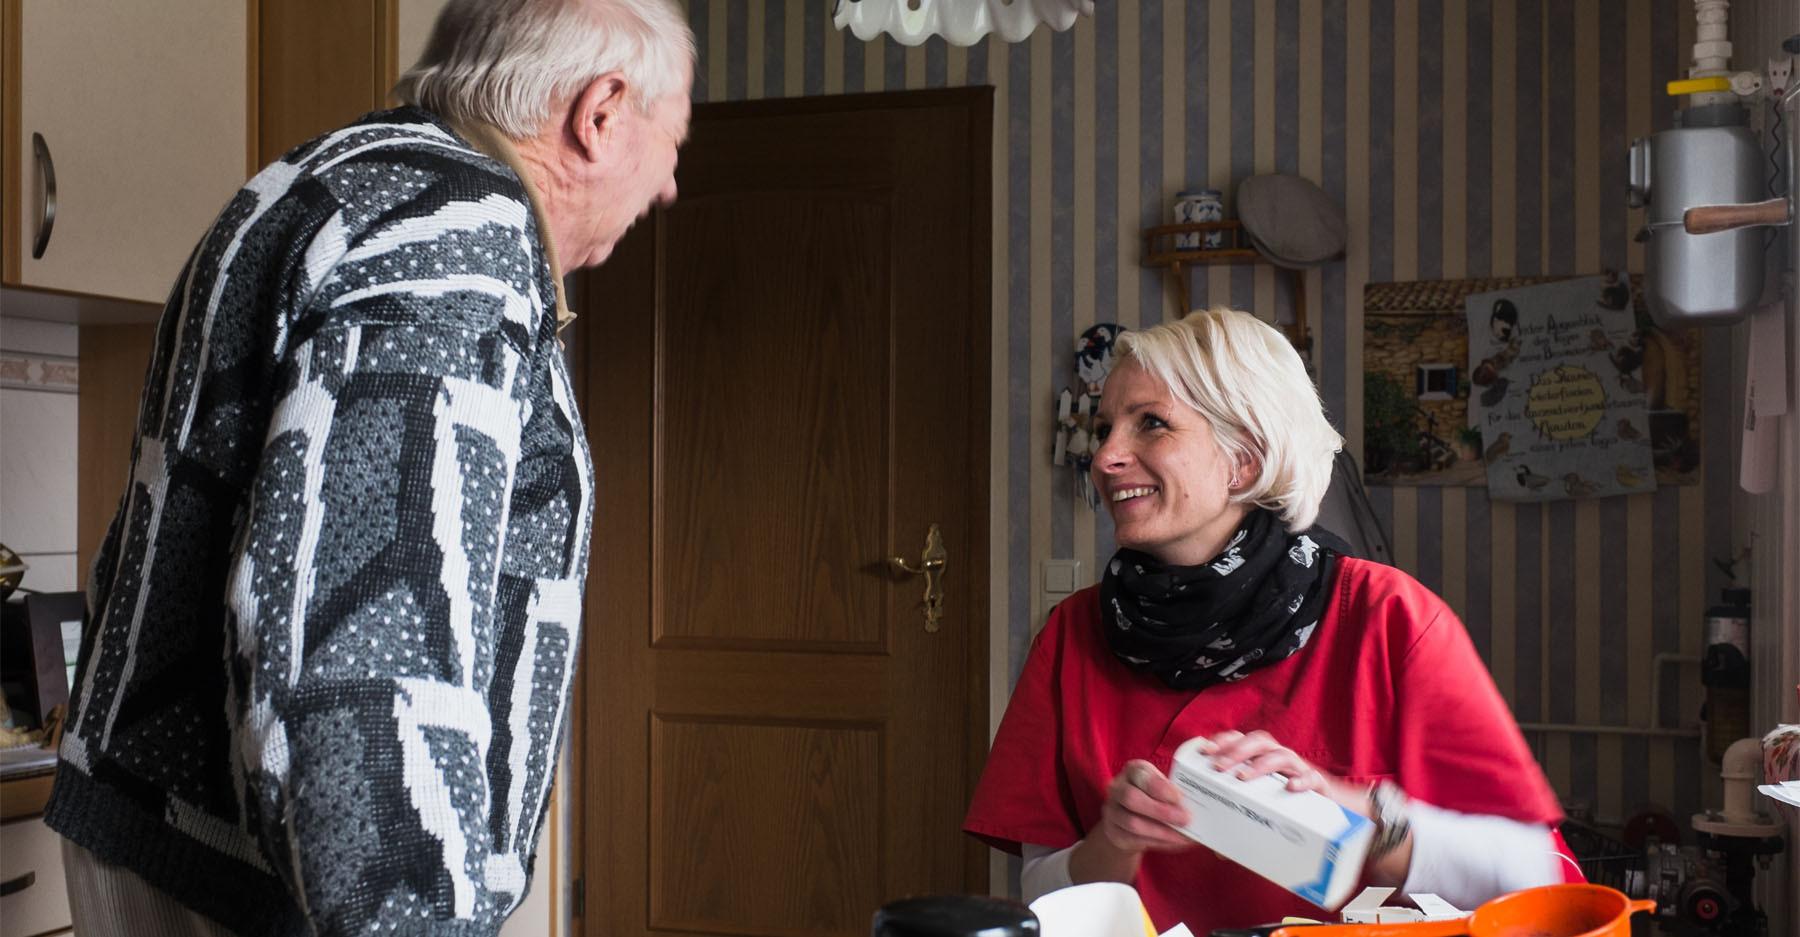 Hauskrankenpflege Dori Gespräch mit Patient